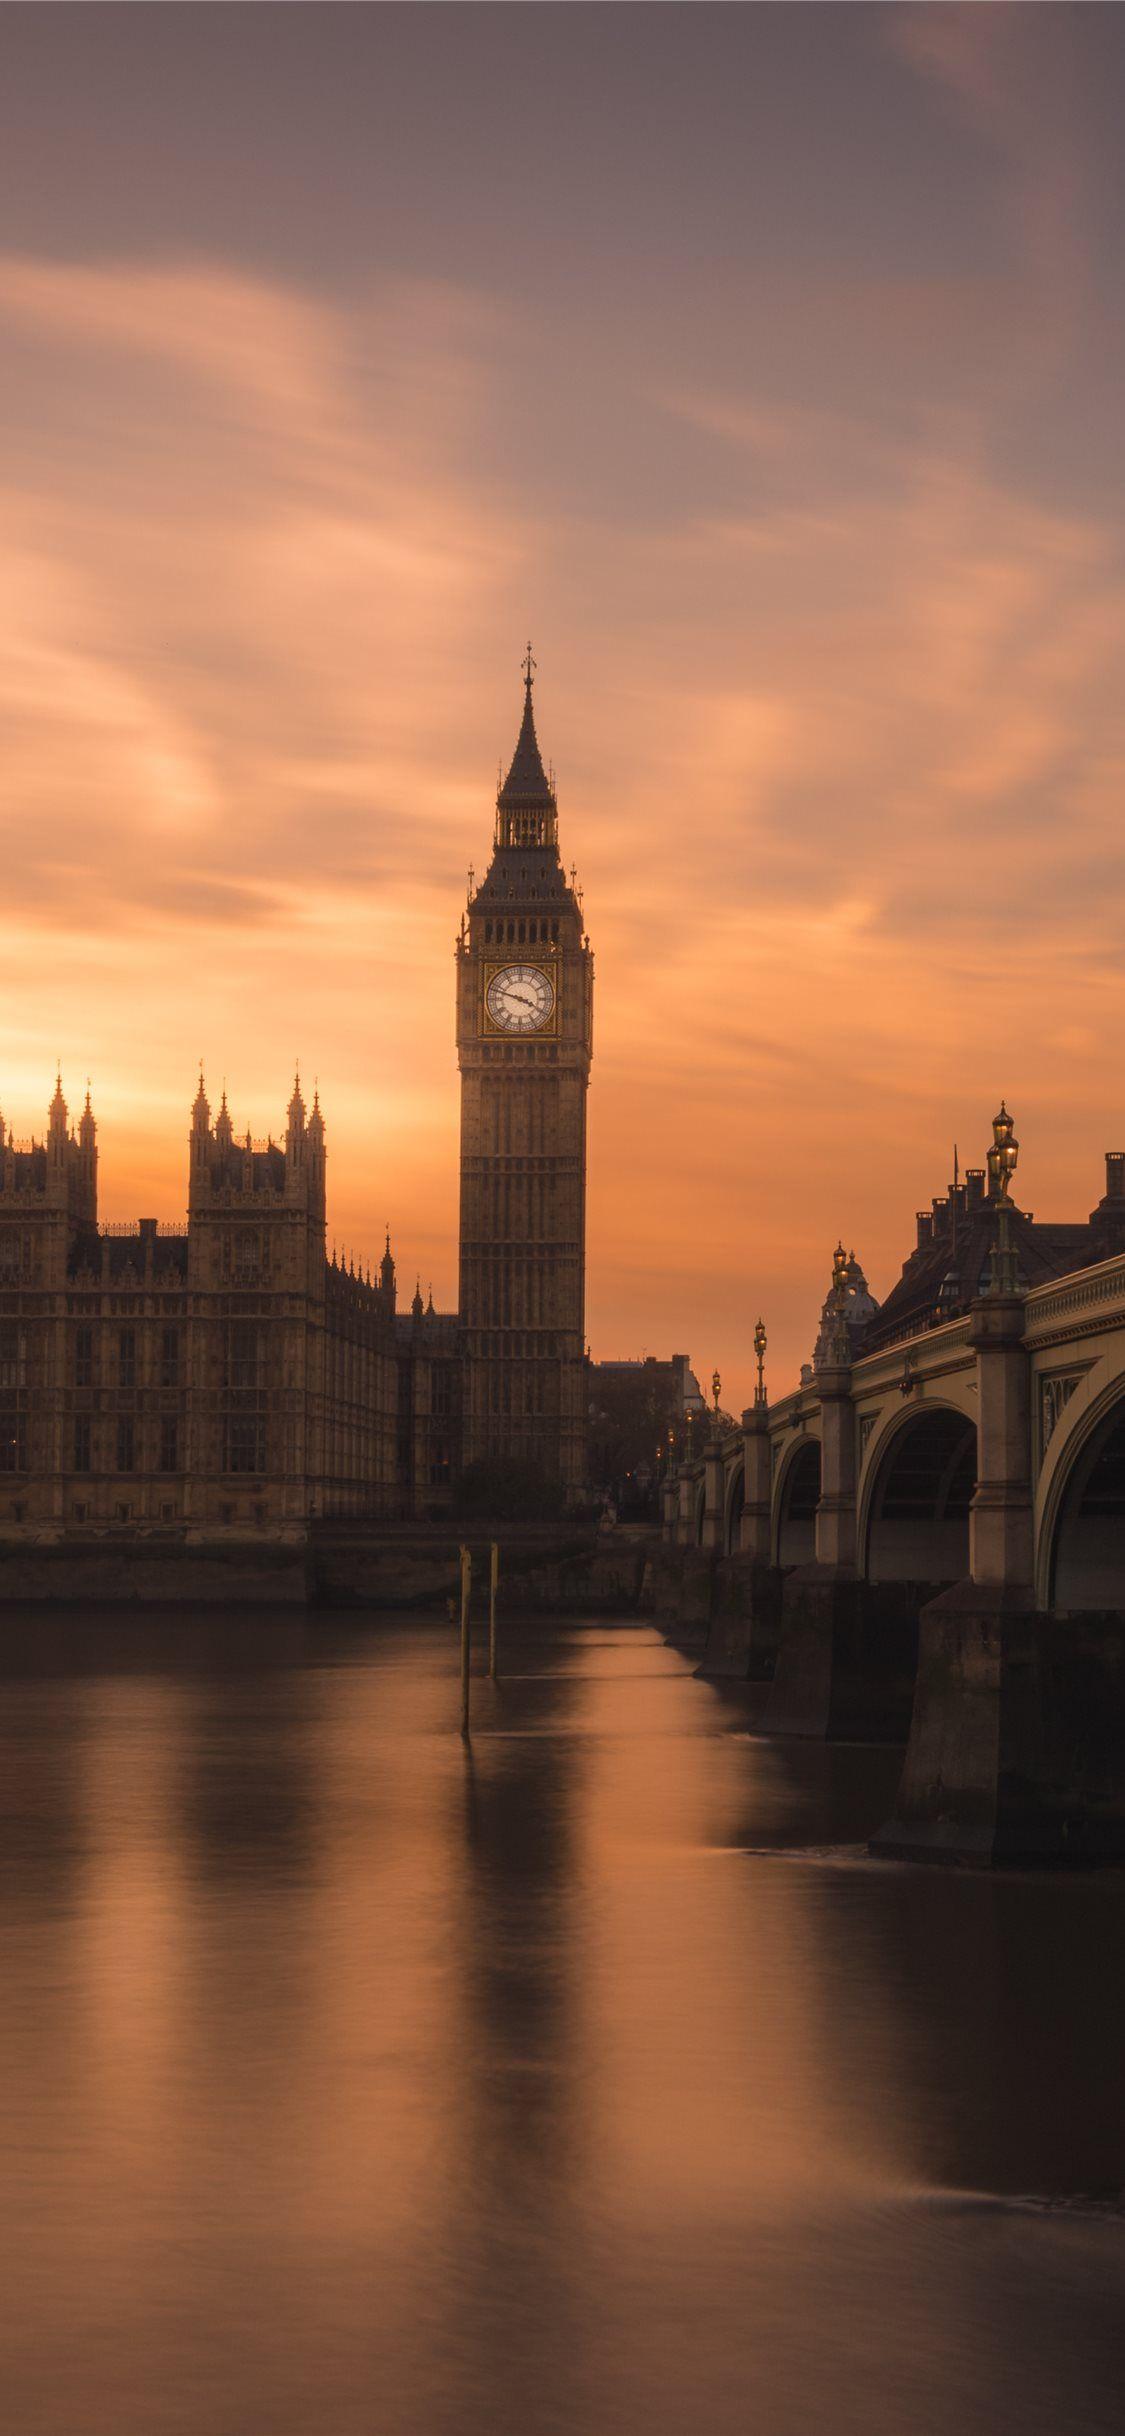 Big Ben in London sunset city grey london England in